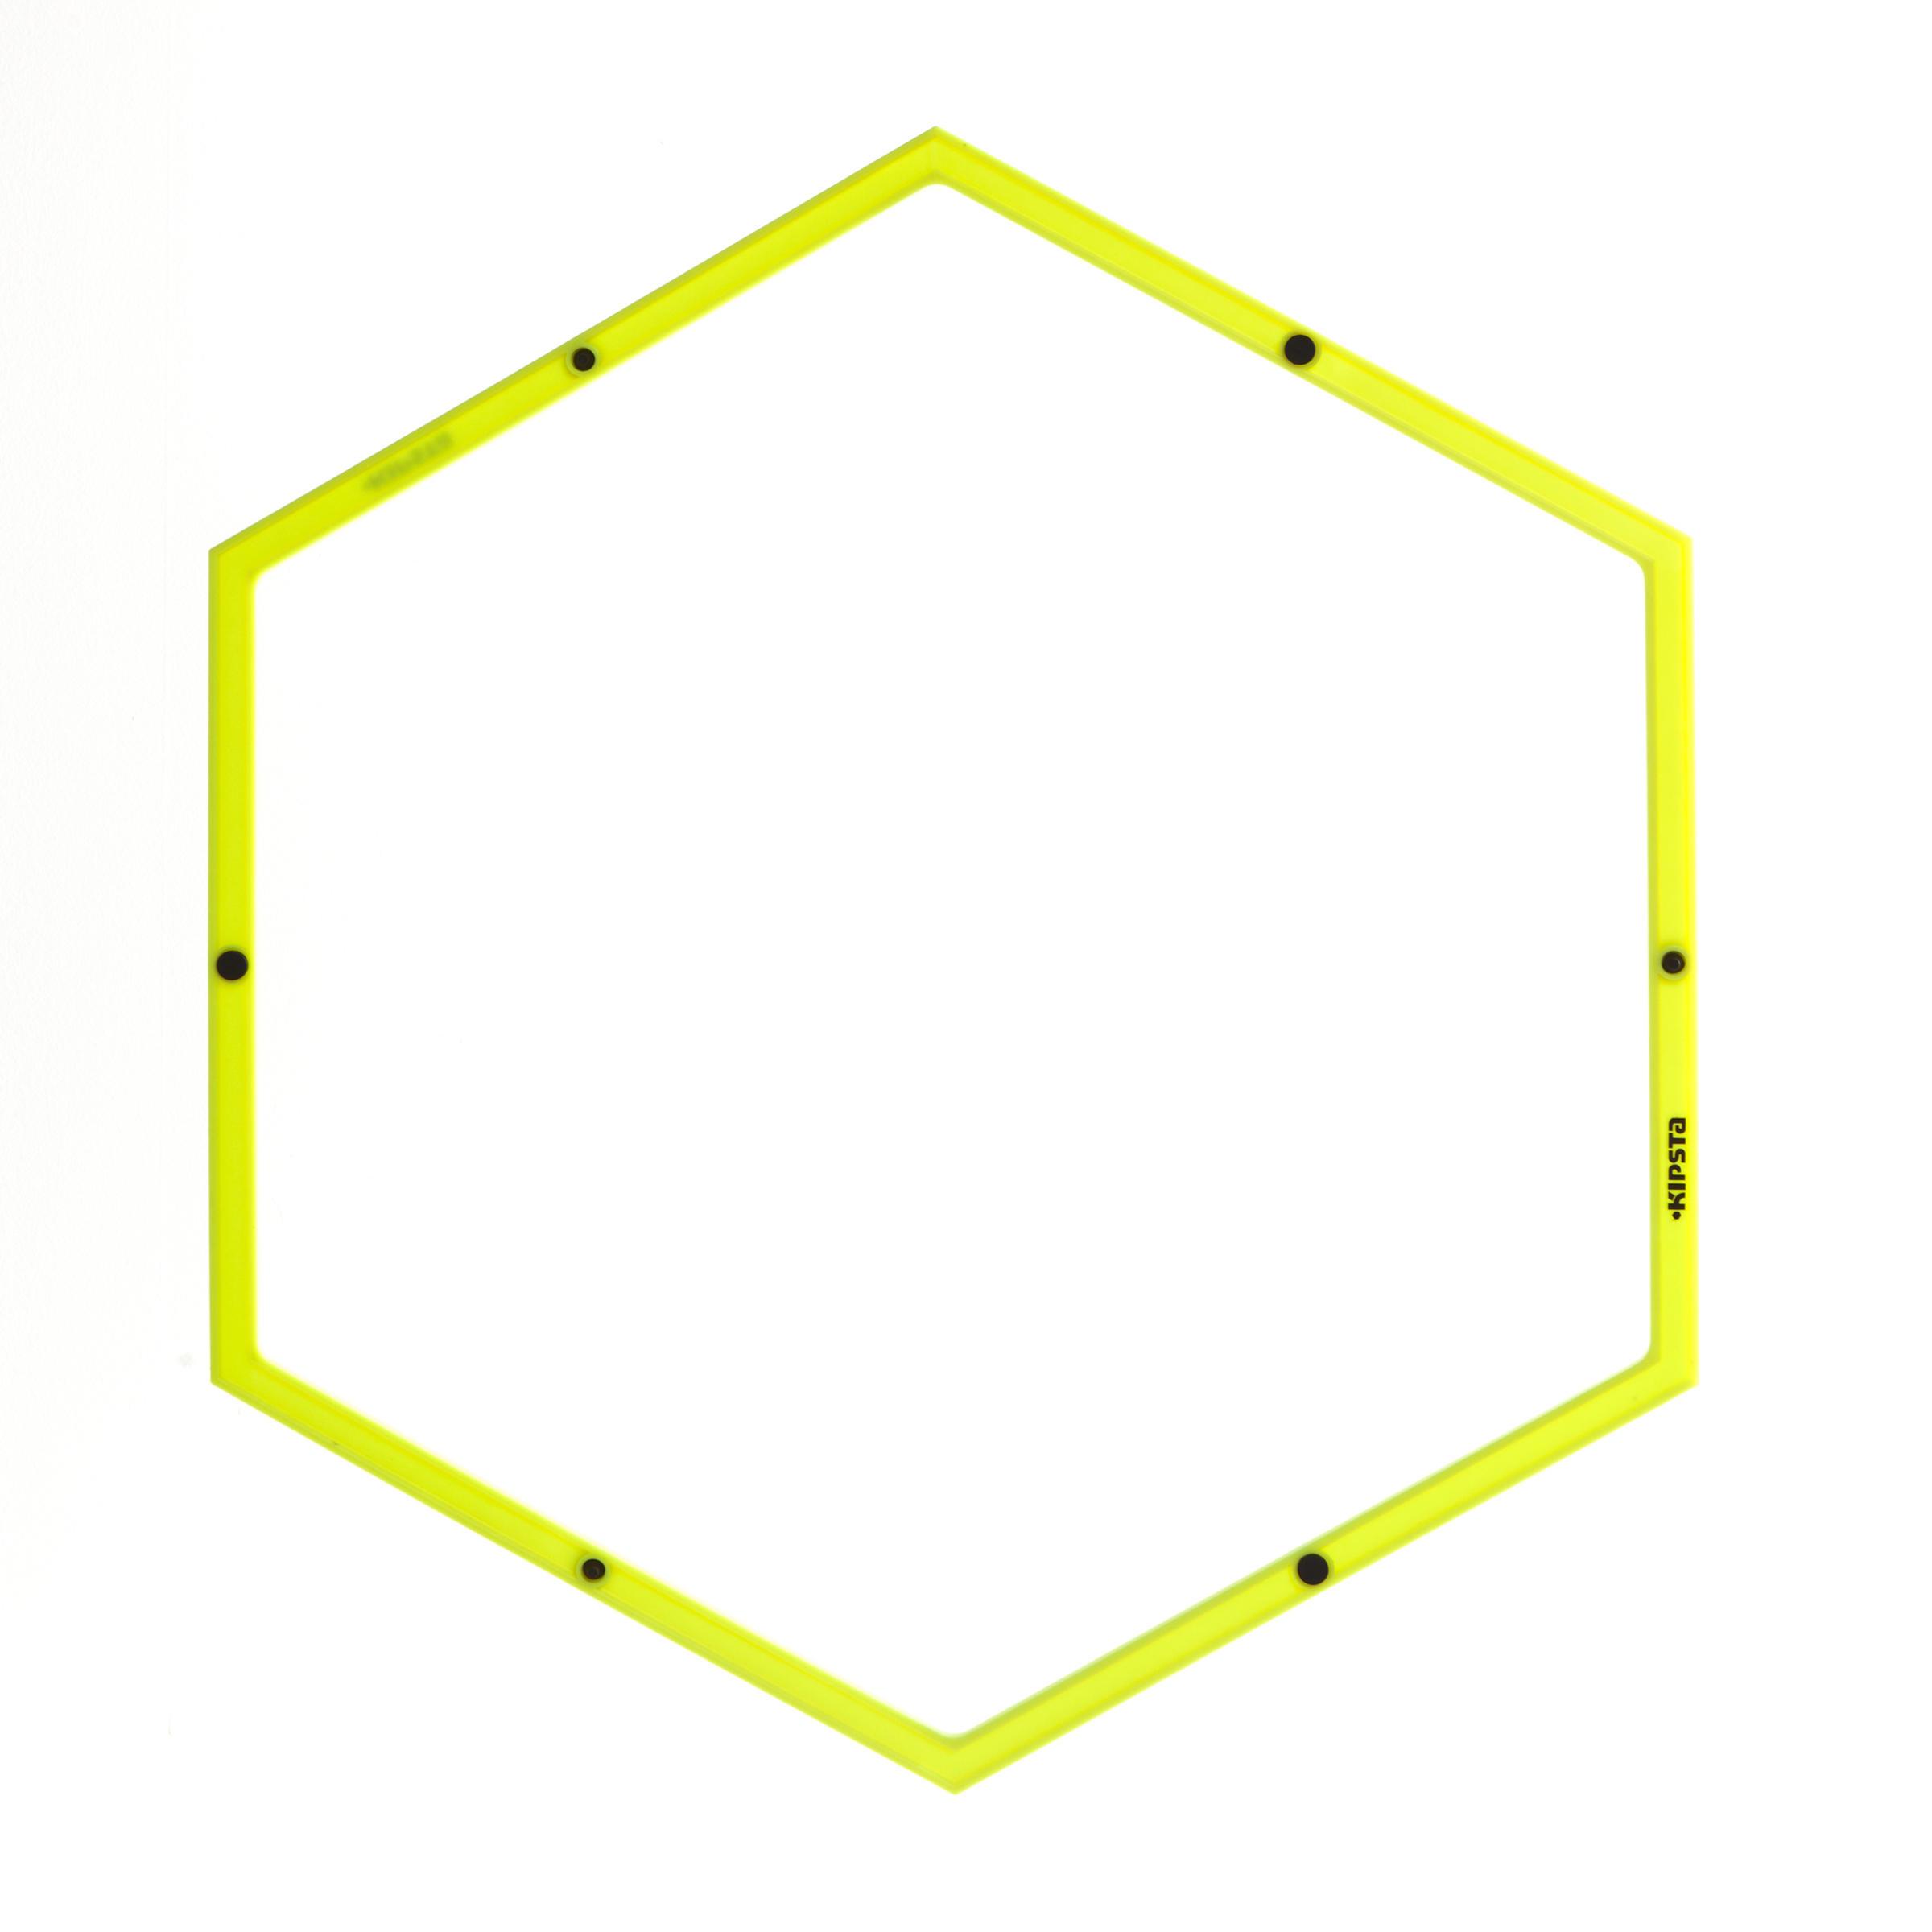 Universal Hoop - 58 cm Yellow